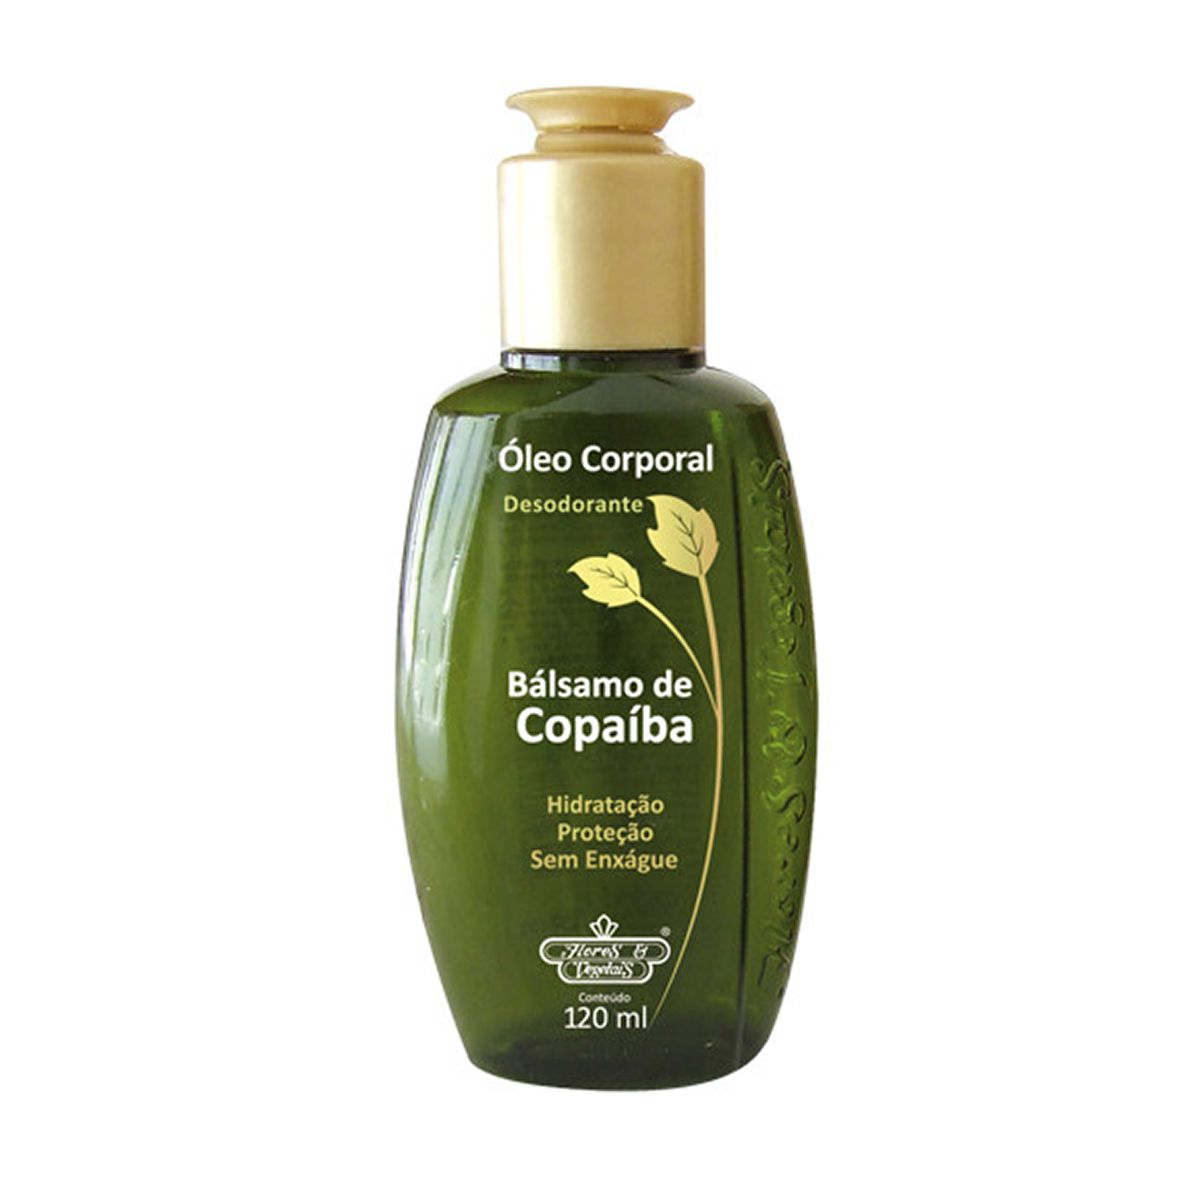 Óleo Corporal Des Bálsamo de Copaíba Flores e Vegetais 120ML